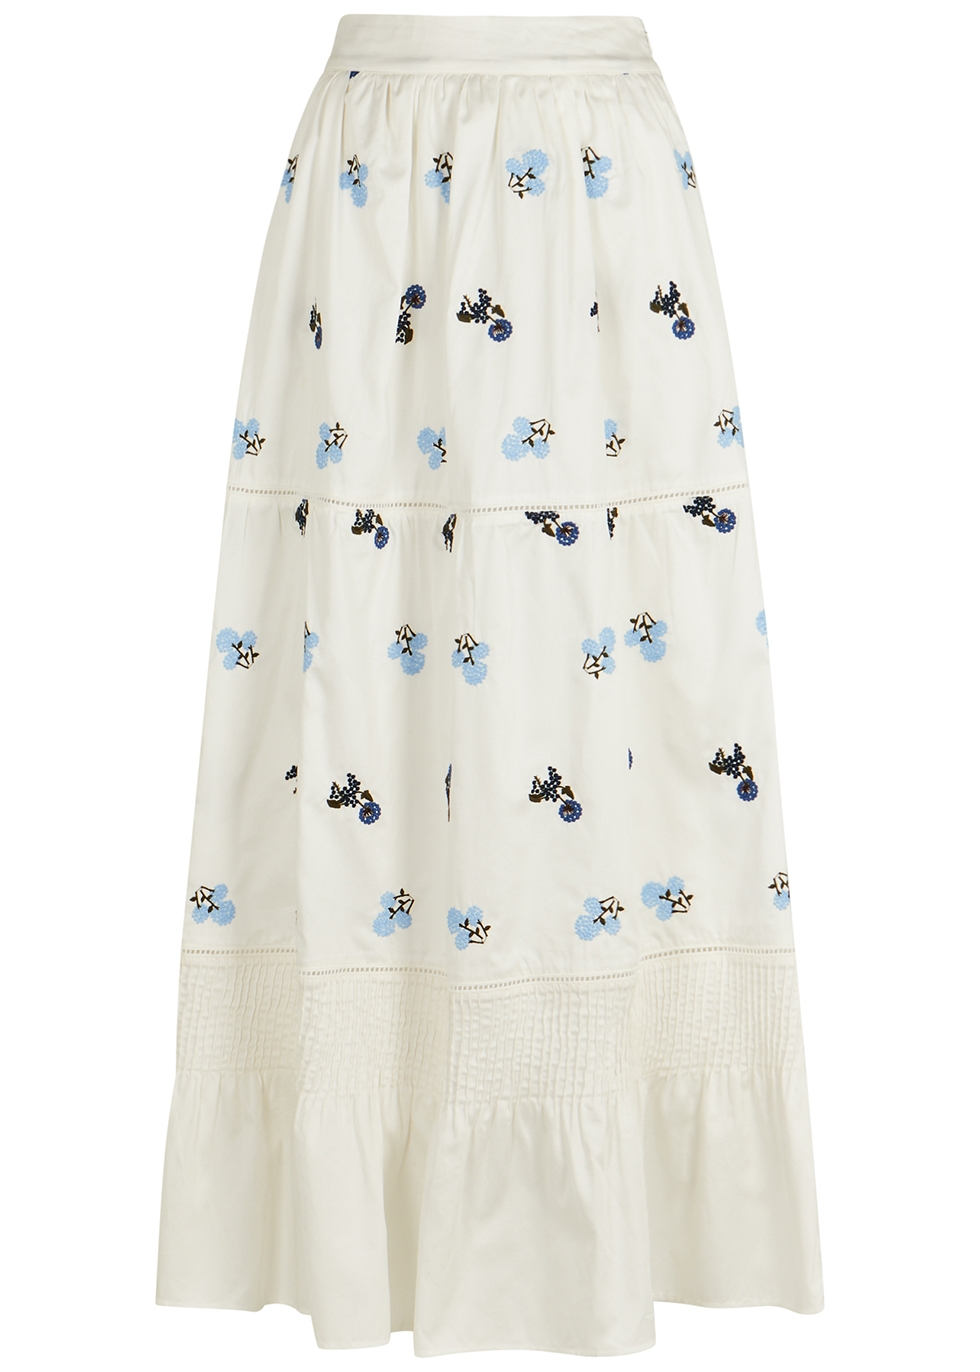 Ornella white embroidered cotton maxi skirt